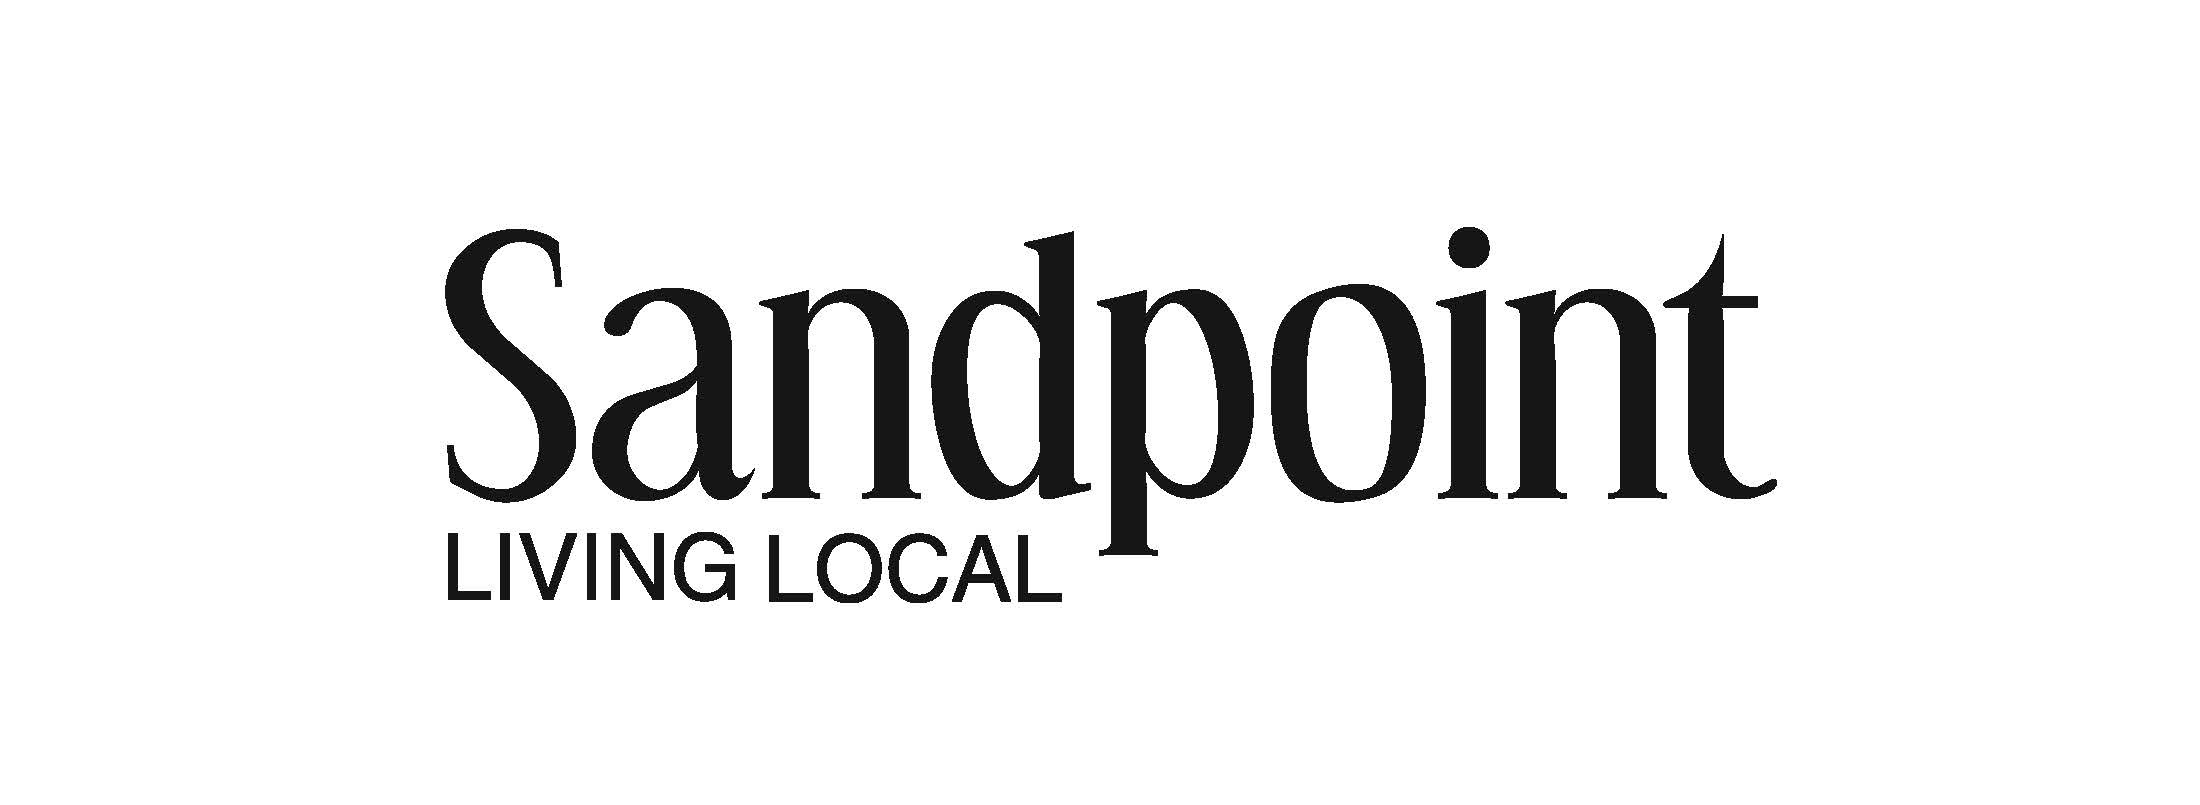 sandpointLivingLocalLogo_Page_2.jpg